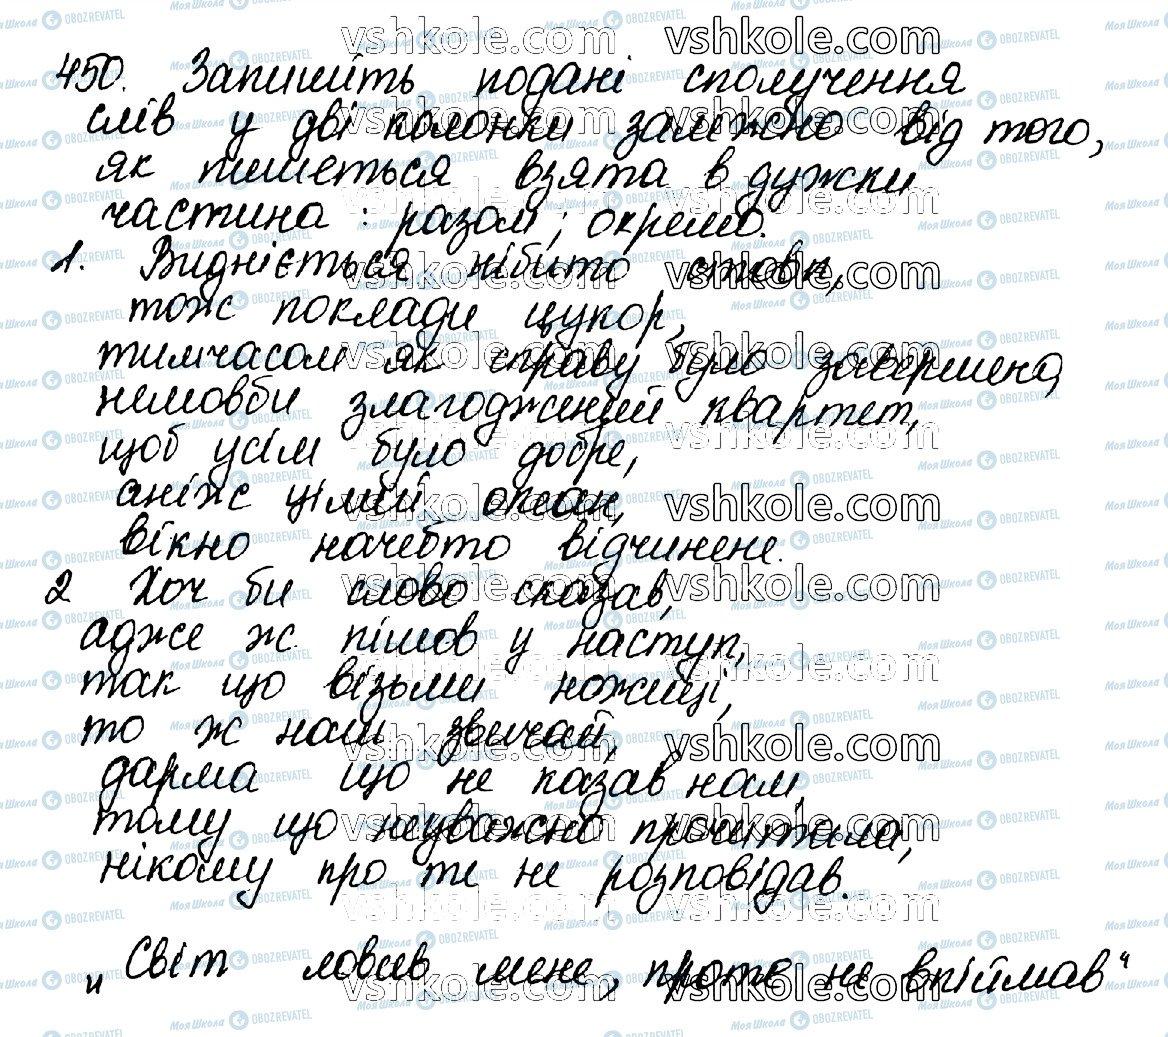 ГДЗ Укр мова 10 класс страница 450